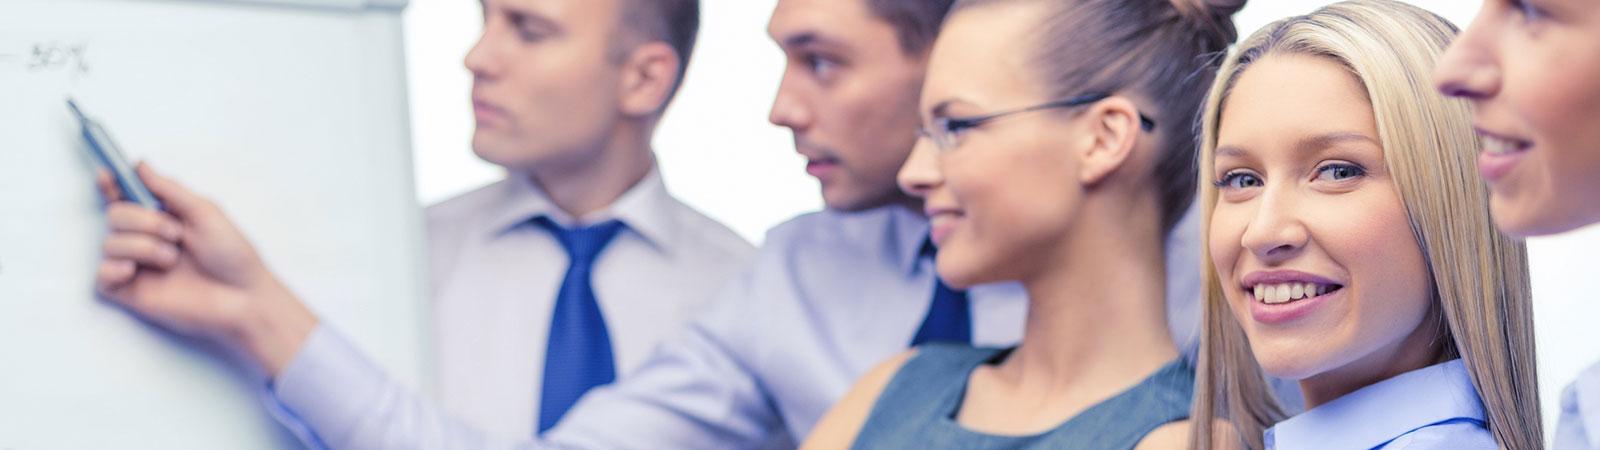 Enghouse AG: Starthilfe ins Berufsleben